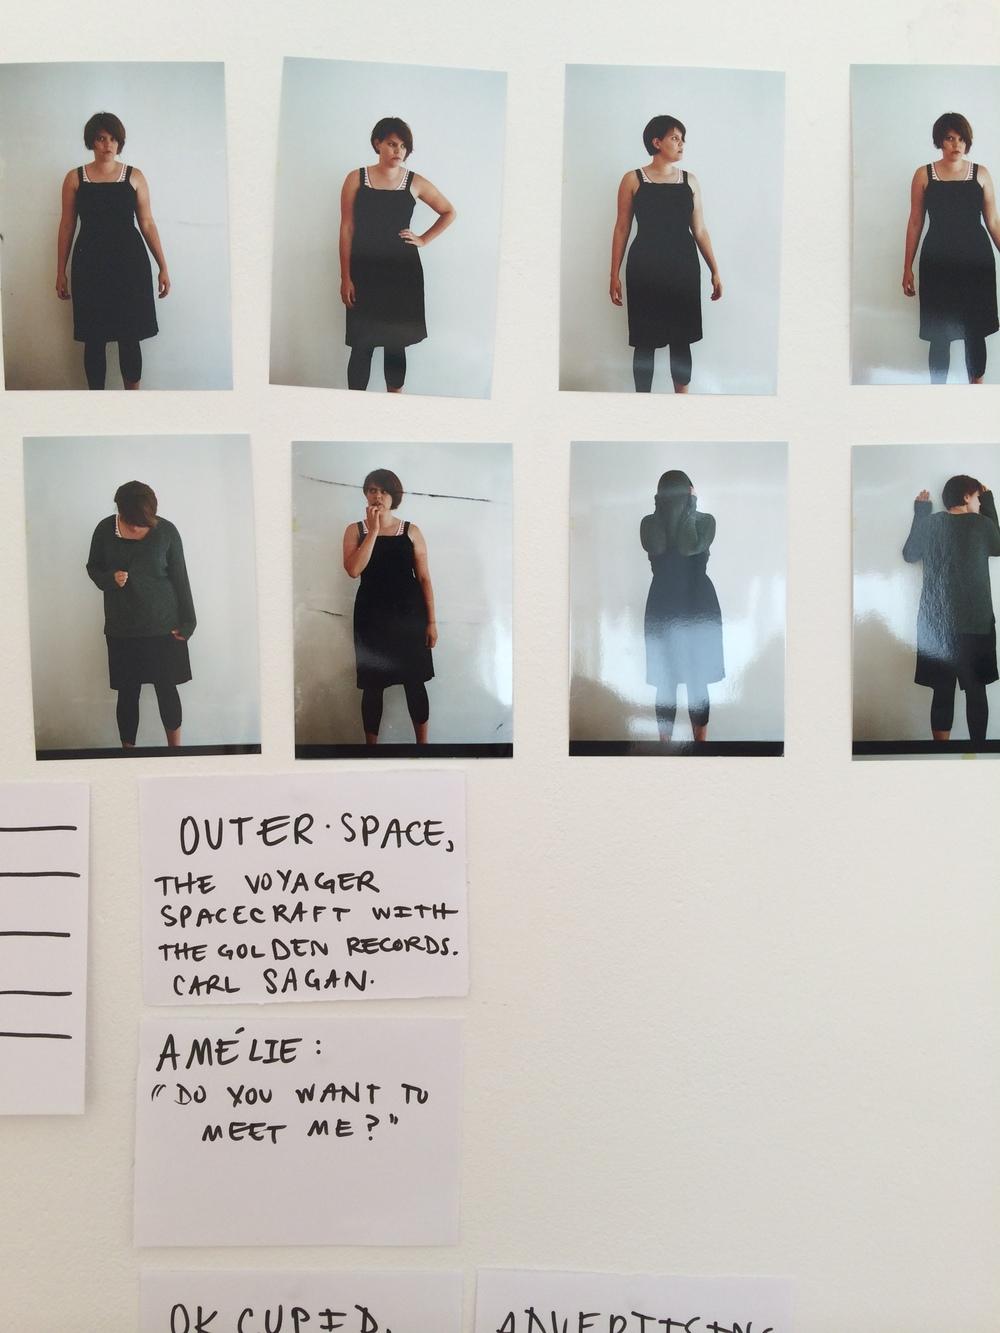 8/12 Re-thinking photographs